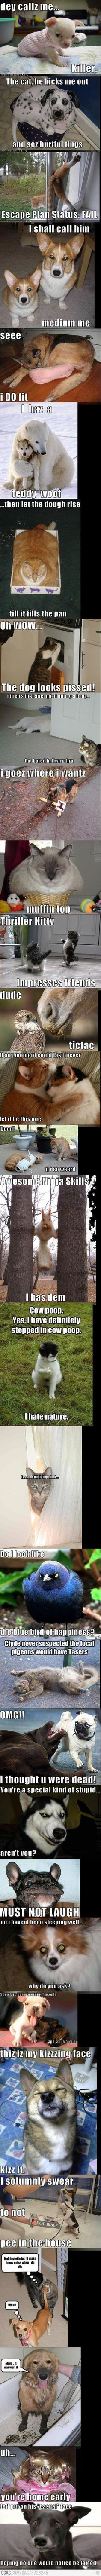 So many funny animal photos, I don't think I can take it!